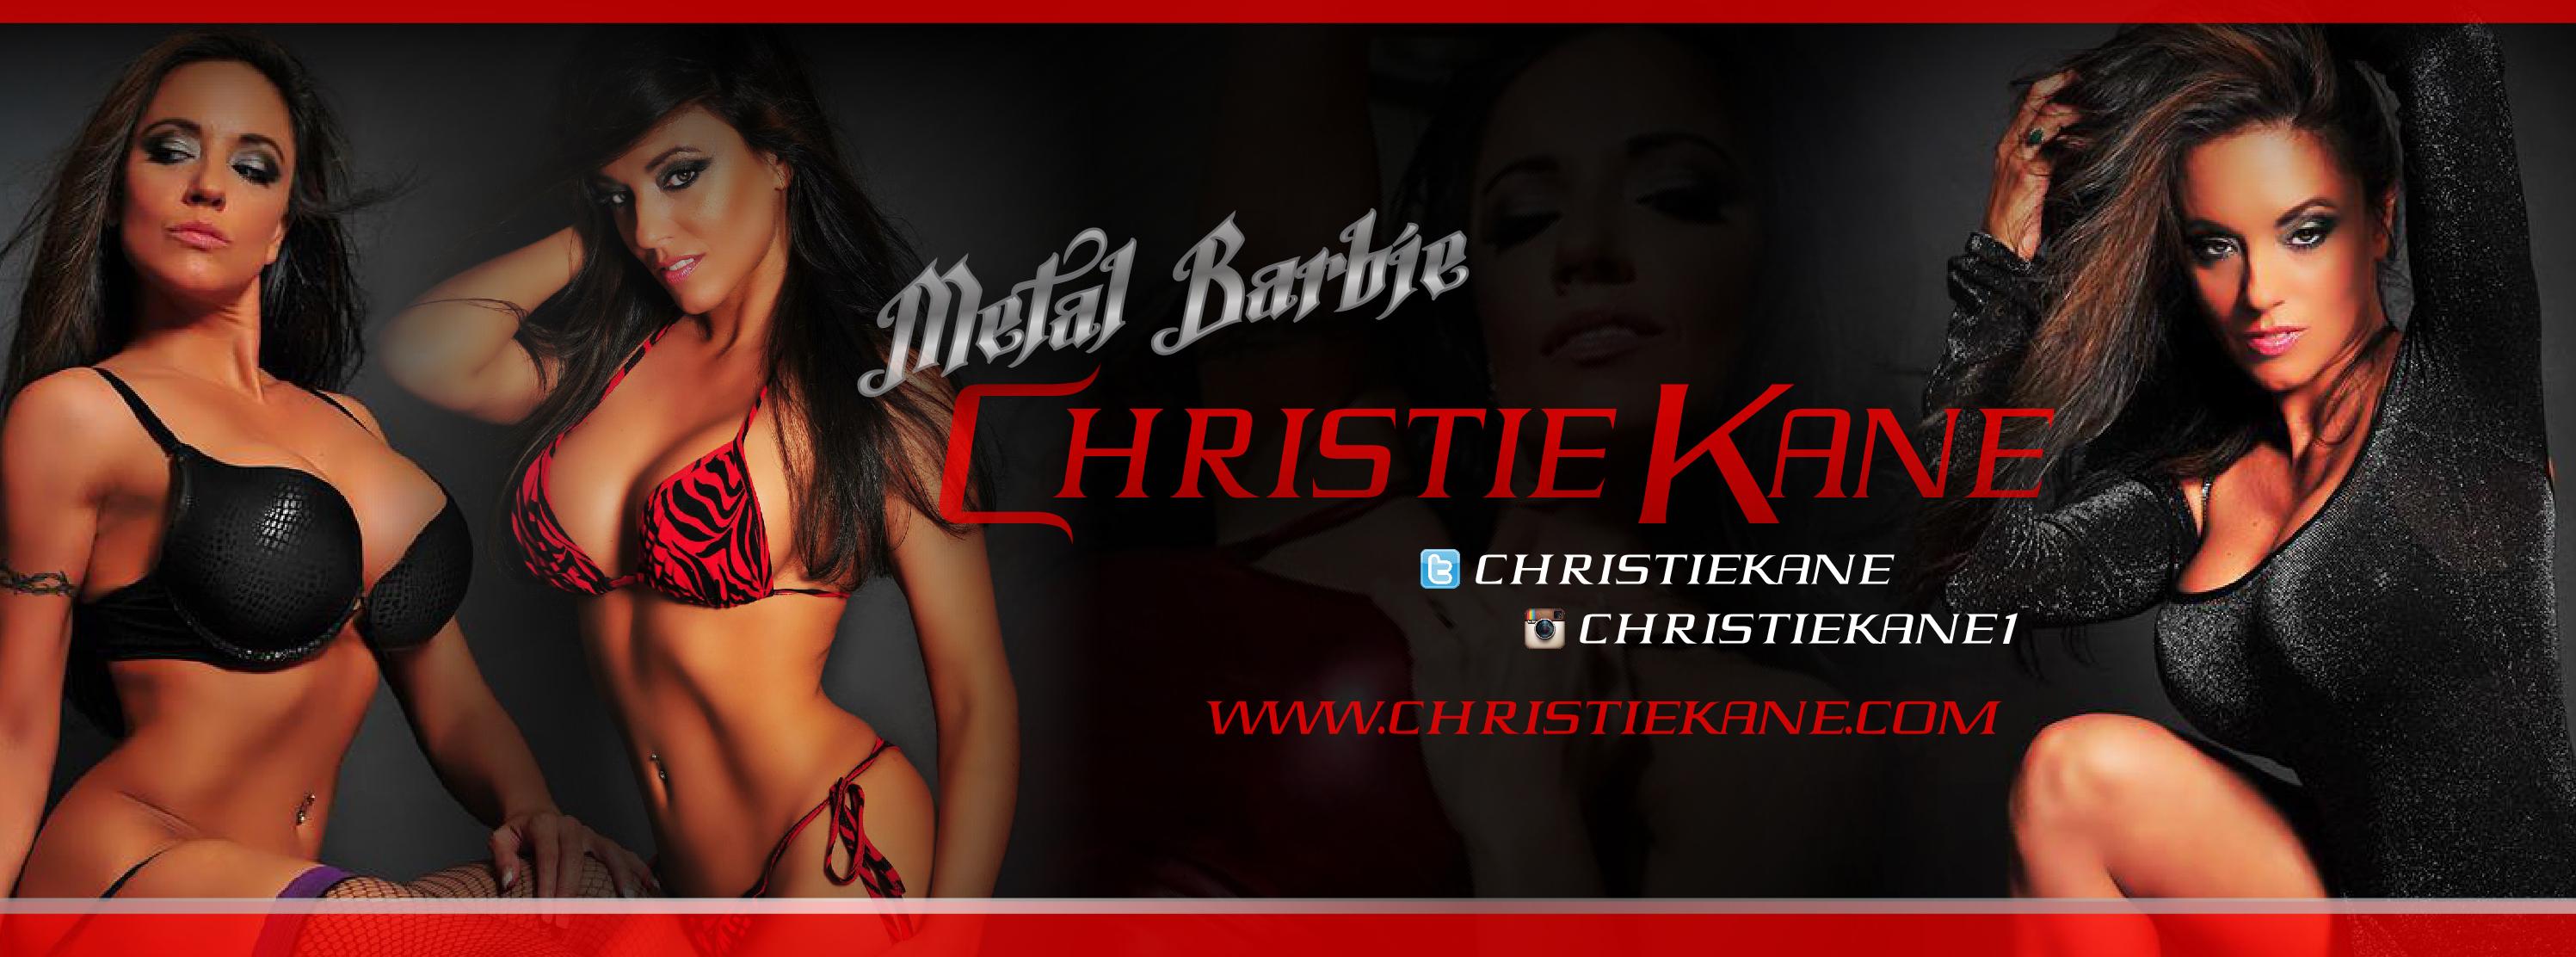 ChristieKaneFBanner.jpg